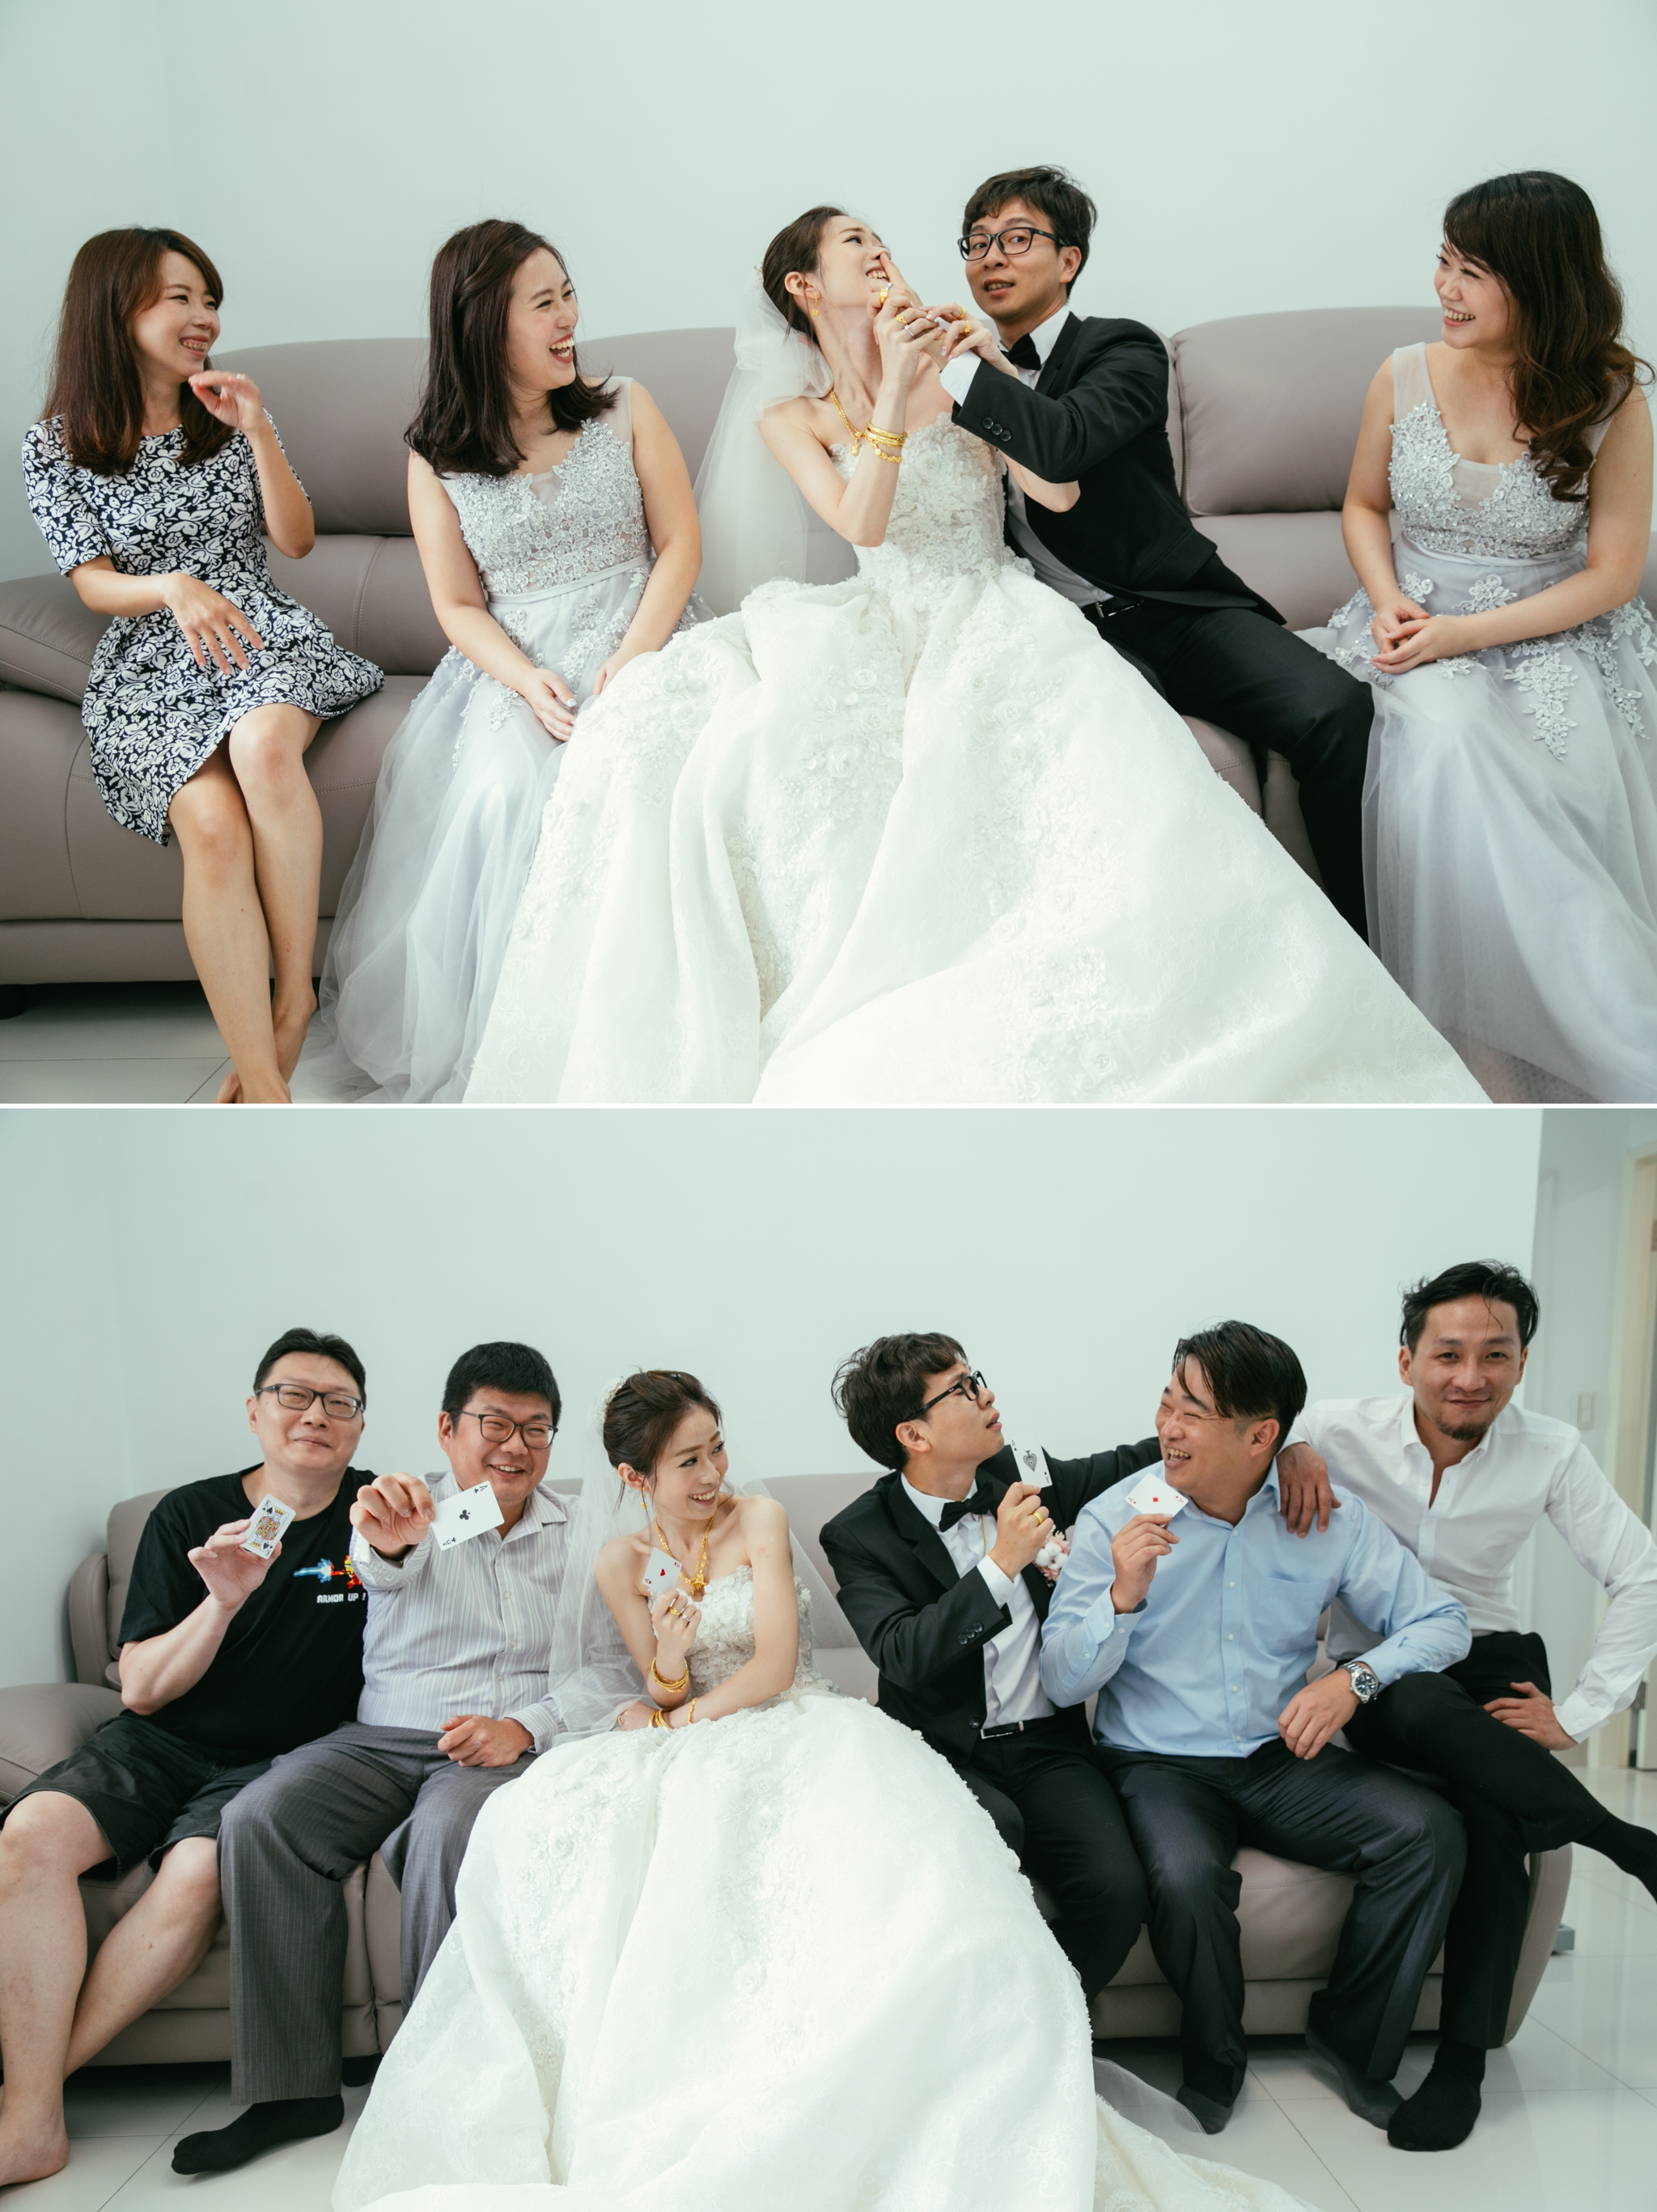 Tina+Nash-wedding-台北婚禮迎娶晚宴-新莊終身大事-101.jpg